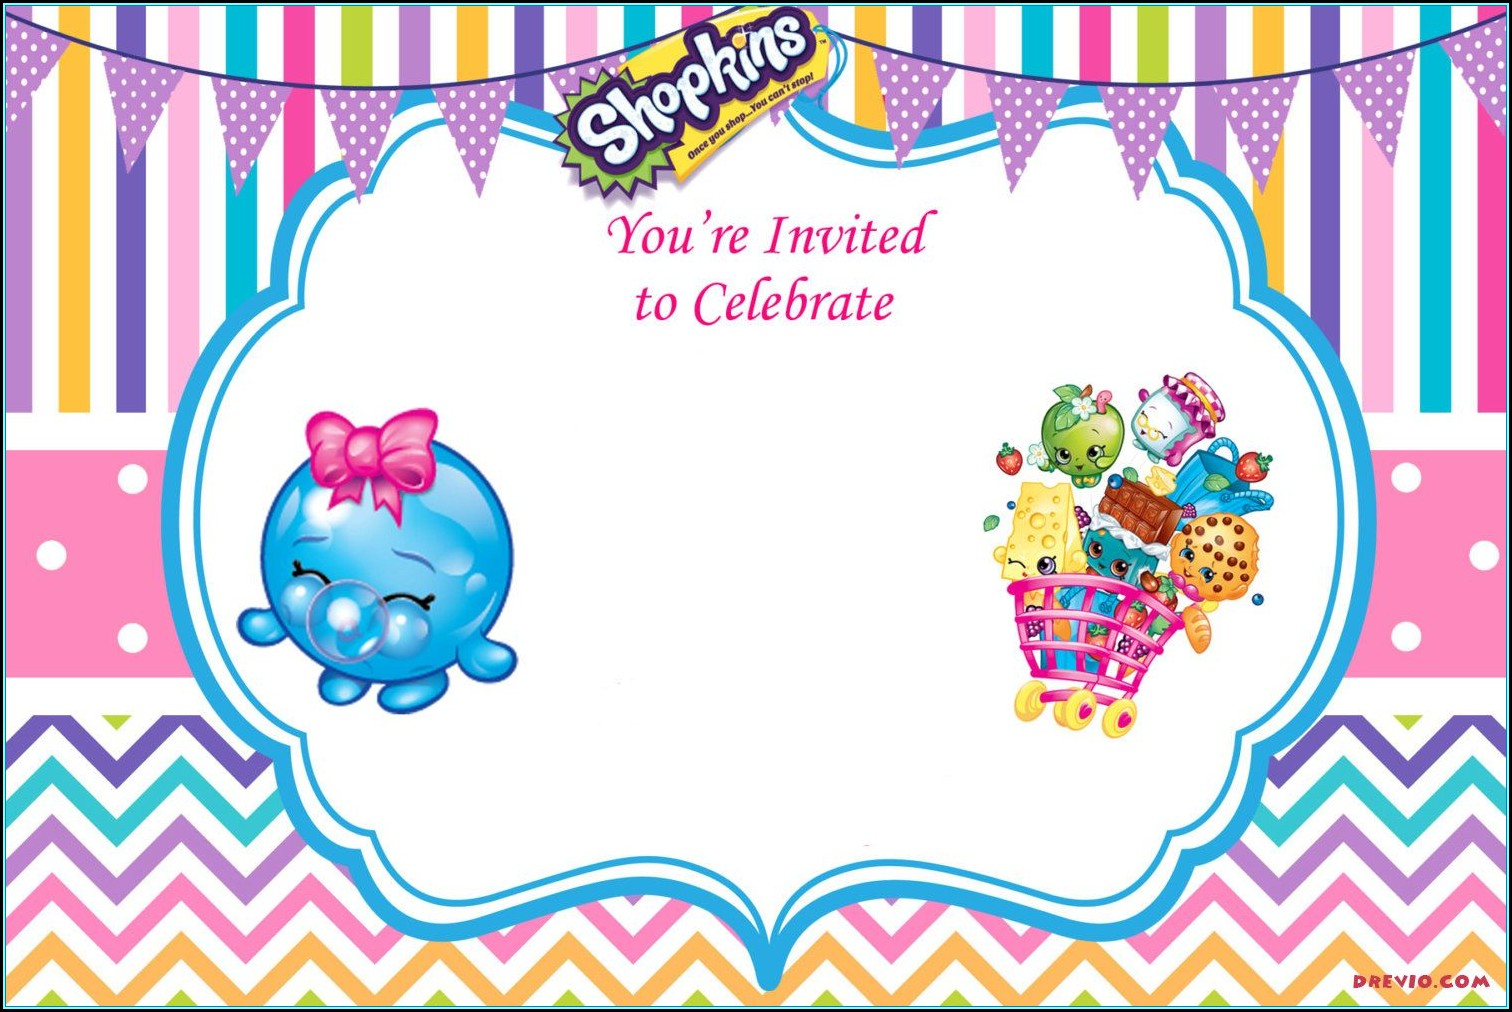 Shopkins Online Invitation Template